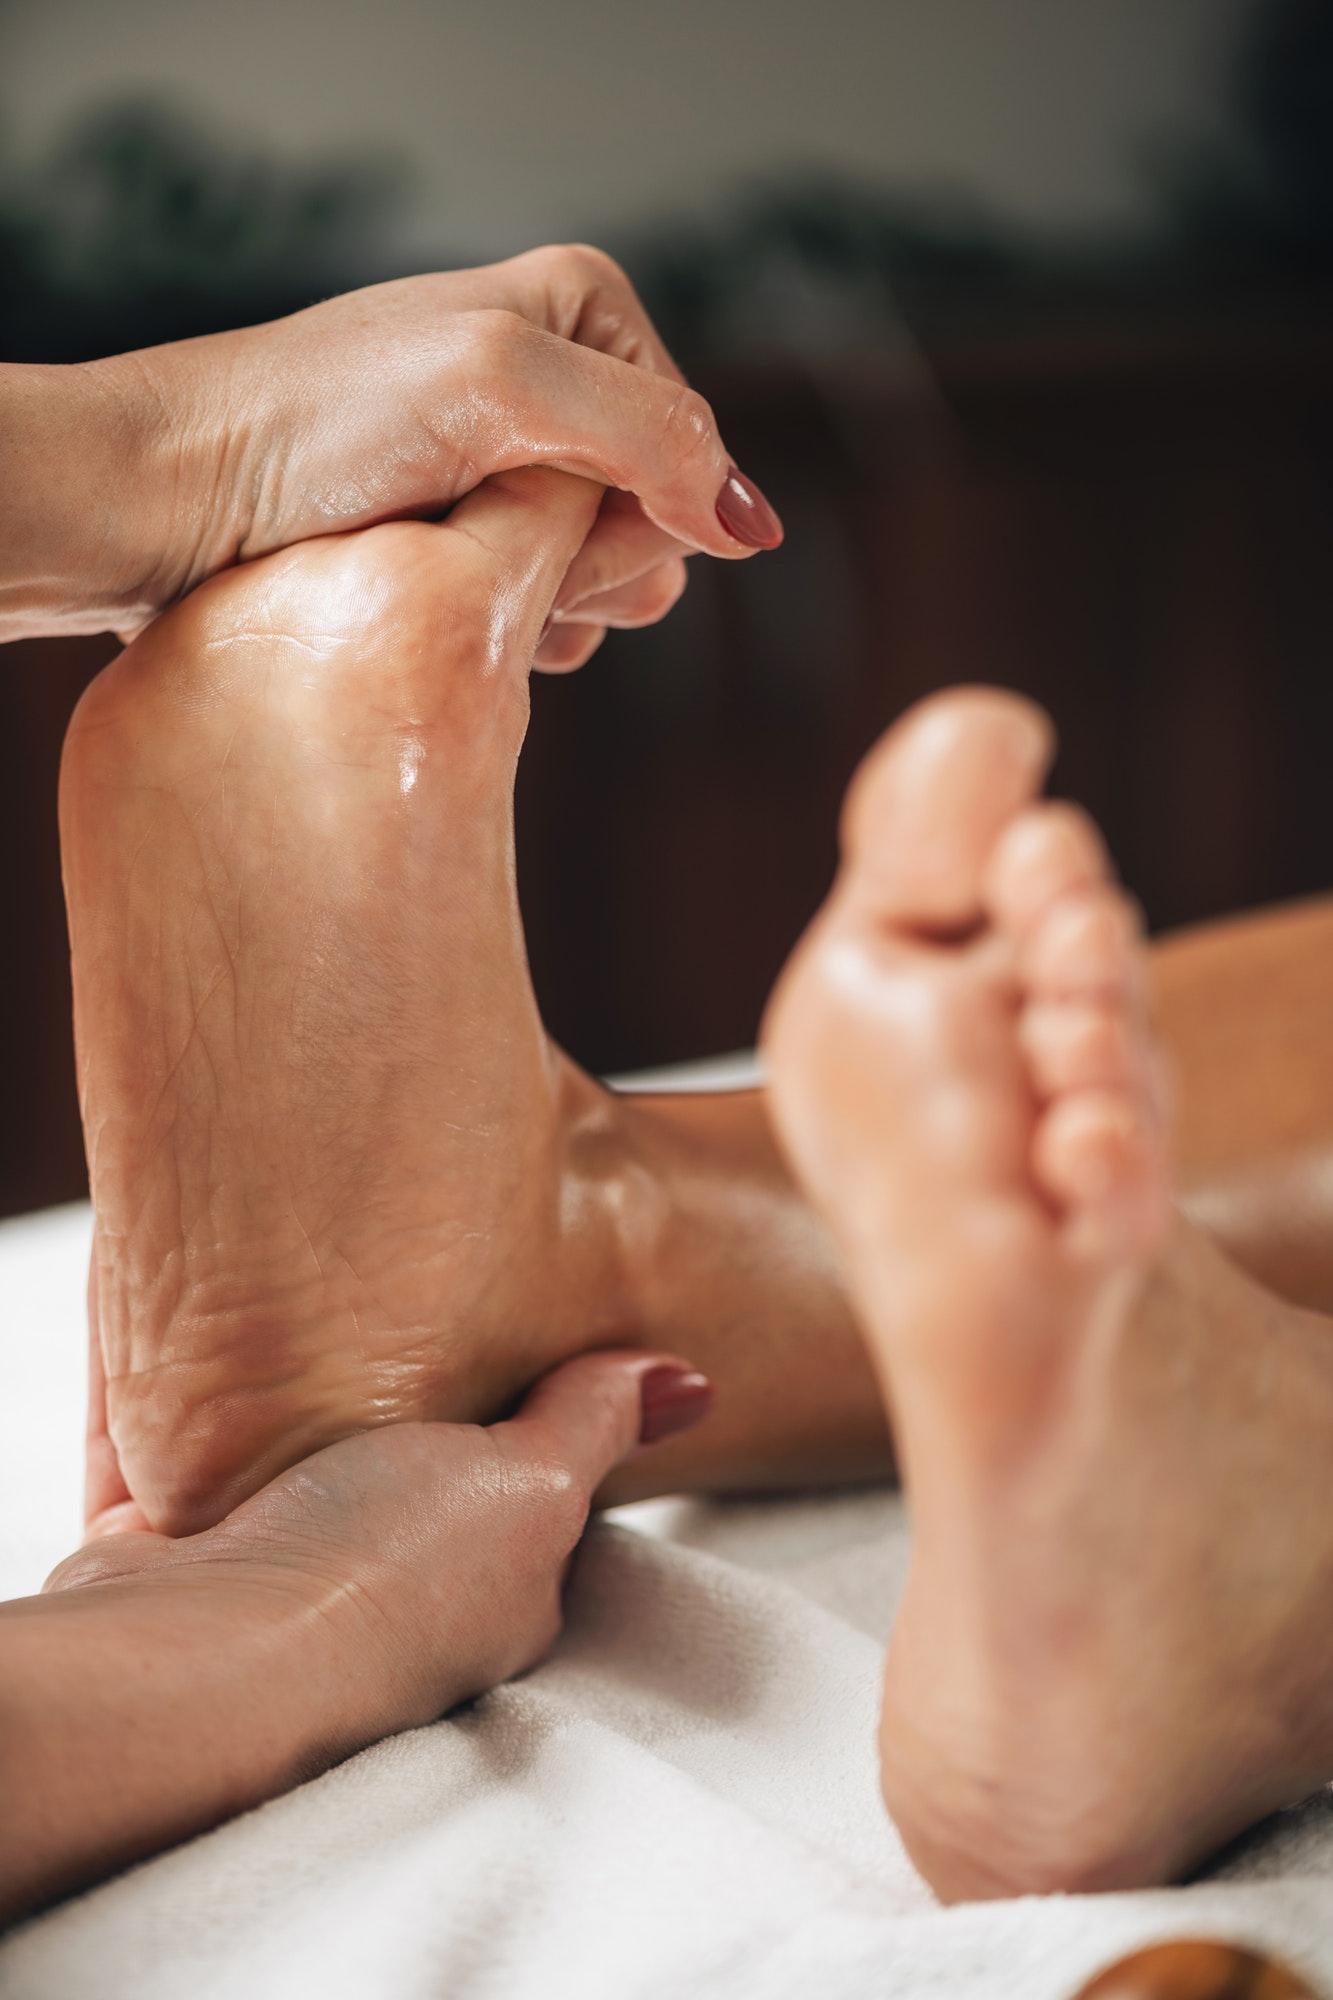 Woman Receiving Foot Massage from Female Masseuse at a Wellness center